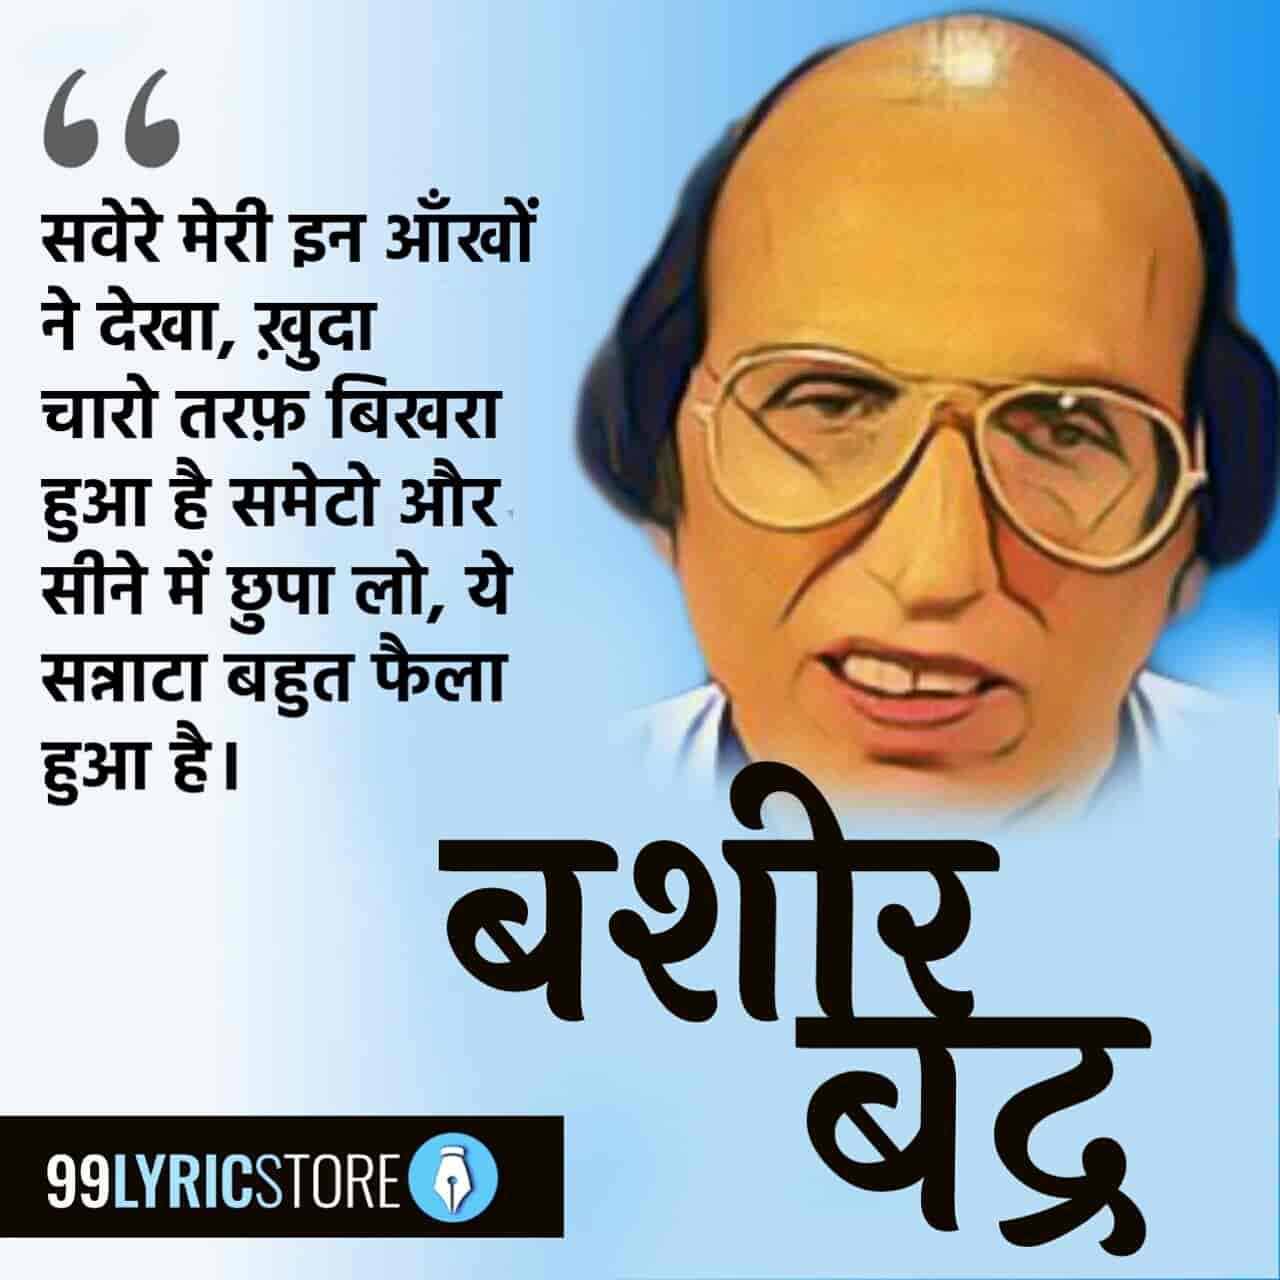 This beautiful ghazal 'Siskte Aab Mein Kiski Sada Hai' has written by Bashir Badr.